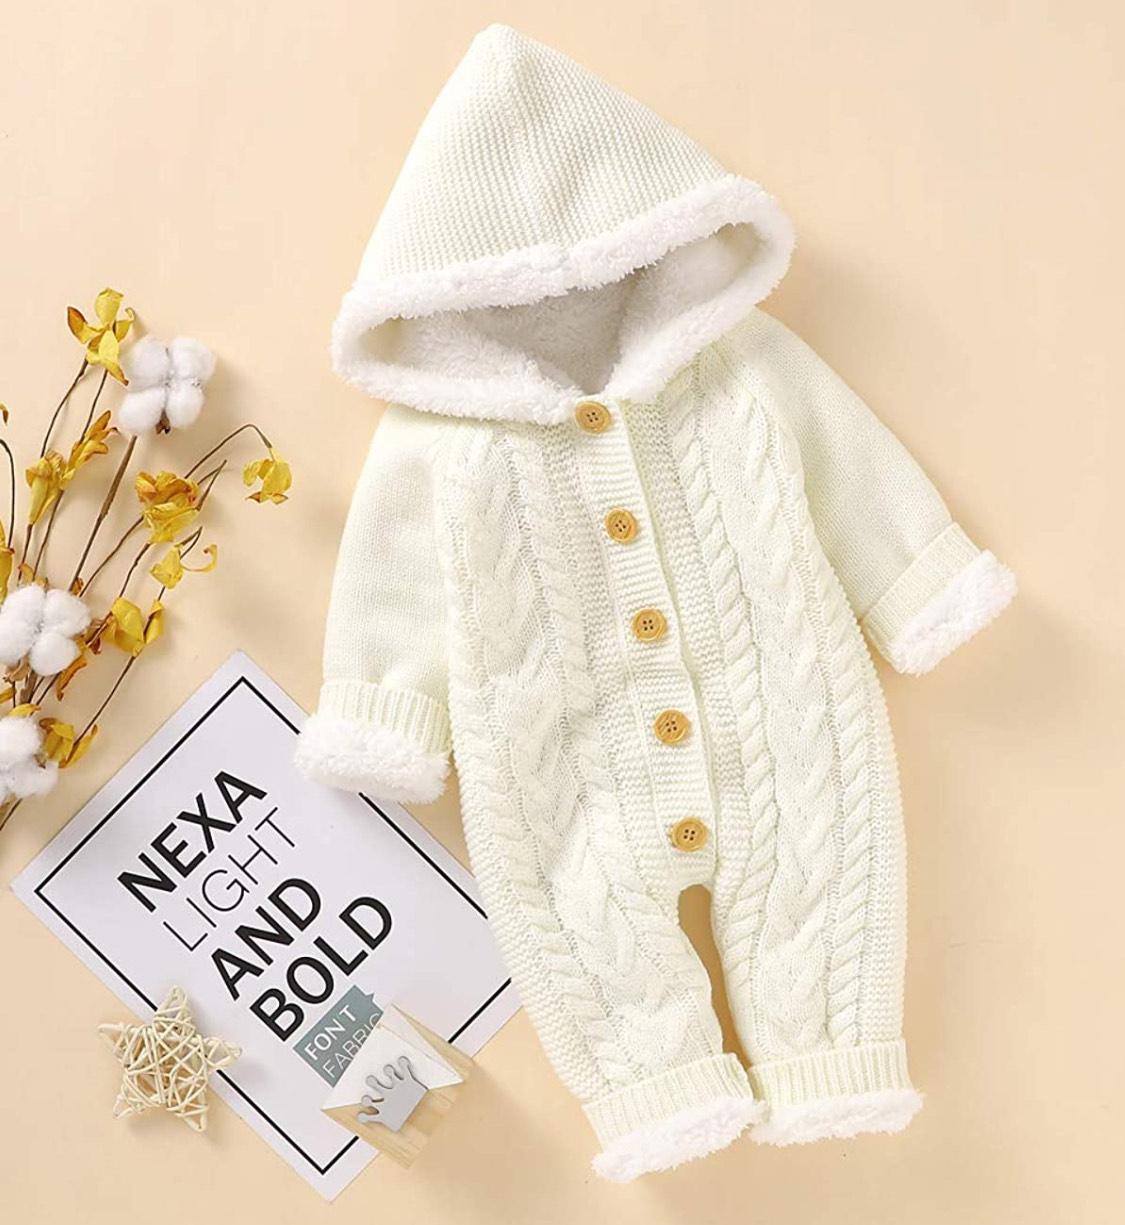 Mameluco invierno bebés (6-12 meses)